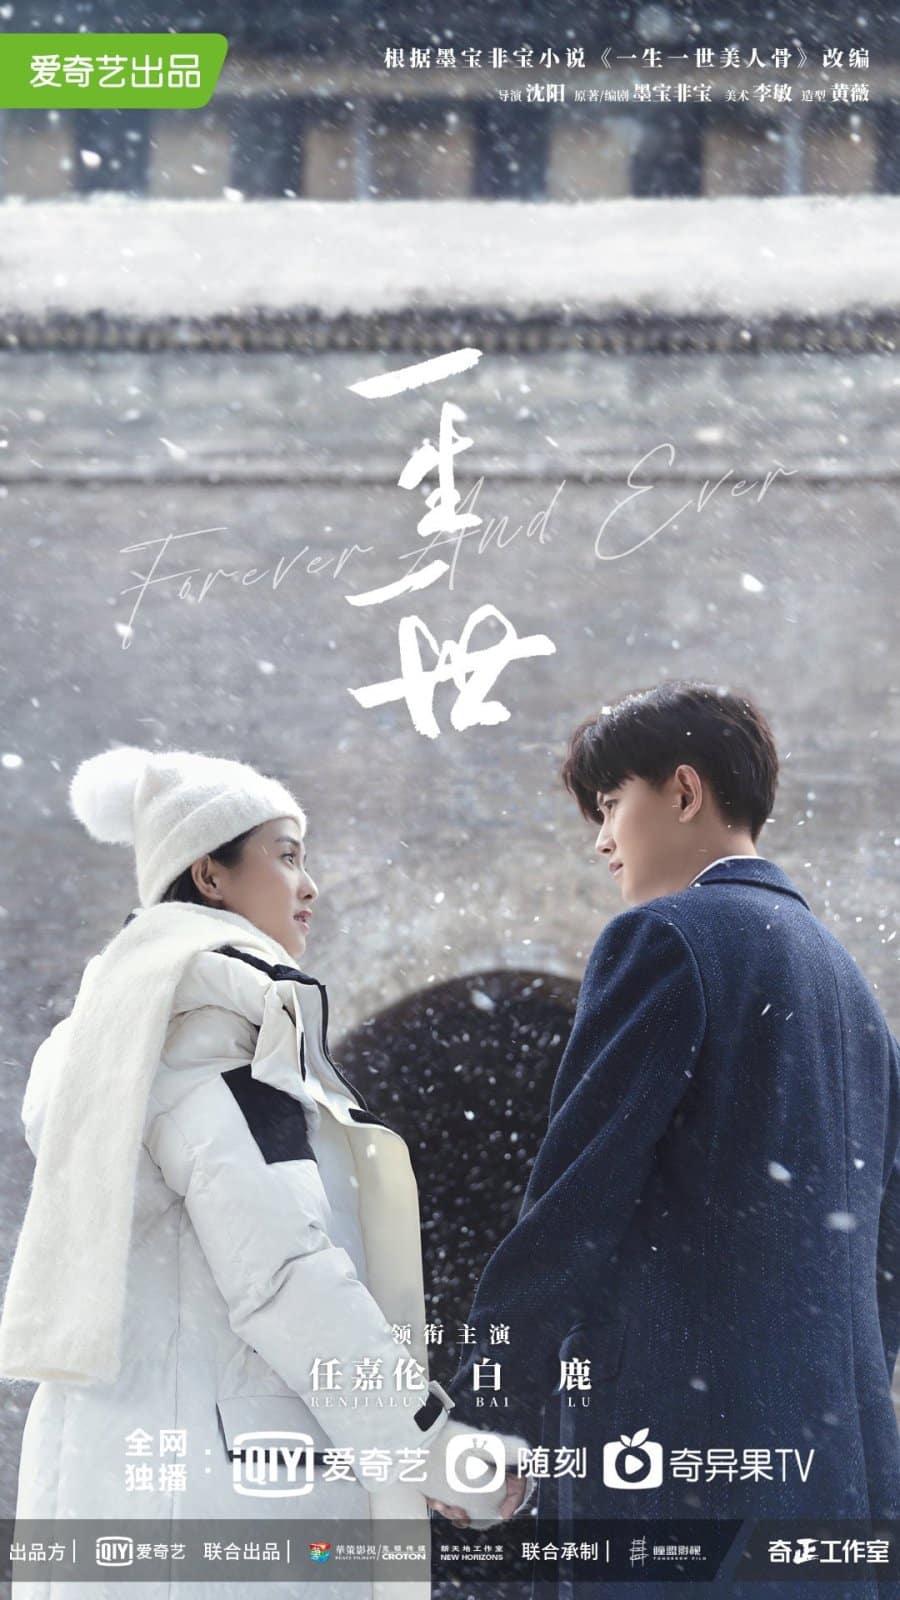 Forever and Ever (2021) ทุกชาติภพกระดูกงดงาม ภาคปัจจุบัน ซับไทย EP1-EP30 [จบ]